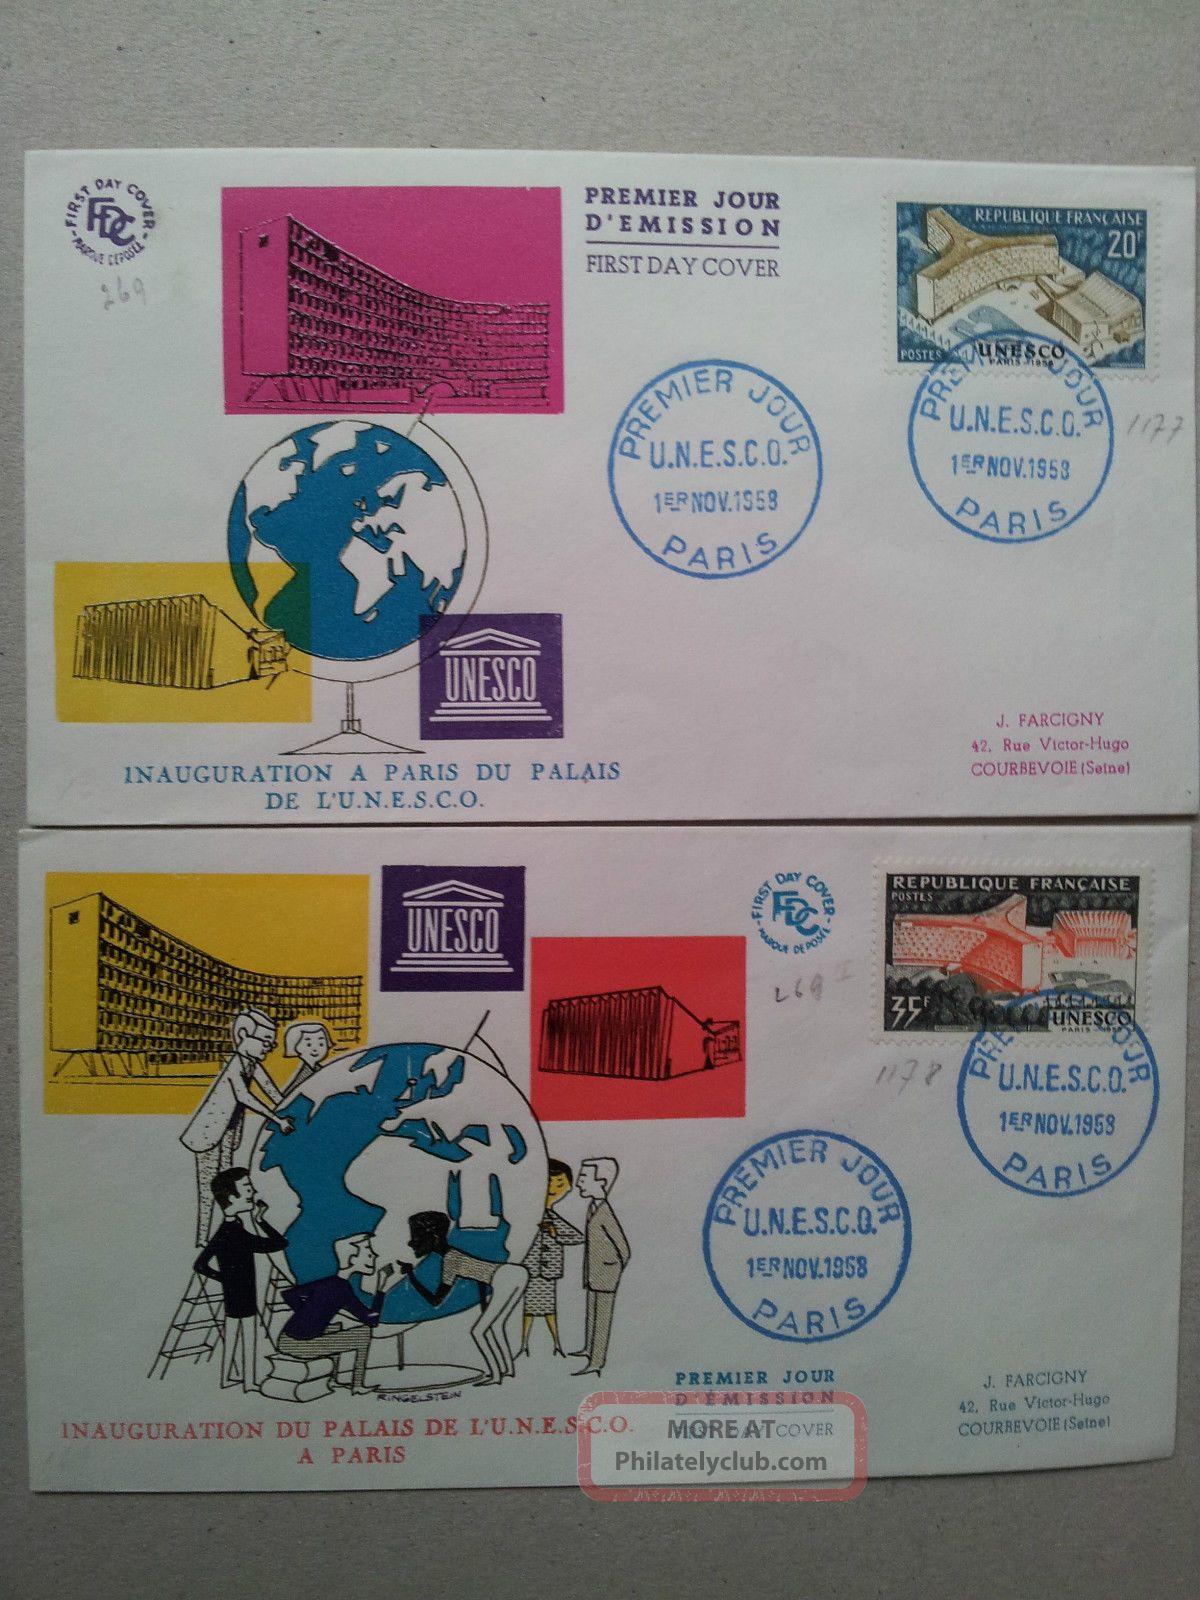 Unesco Office in Paris of Unesco in Paris Stamps